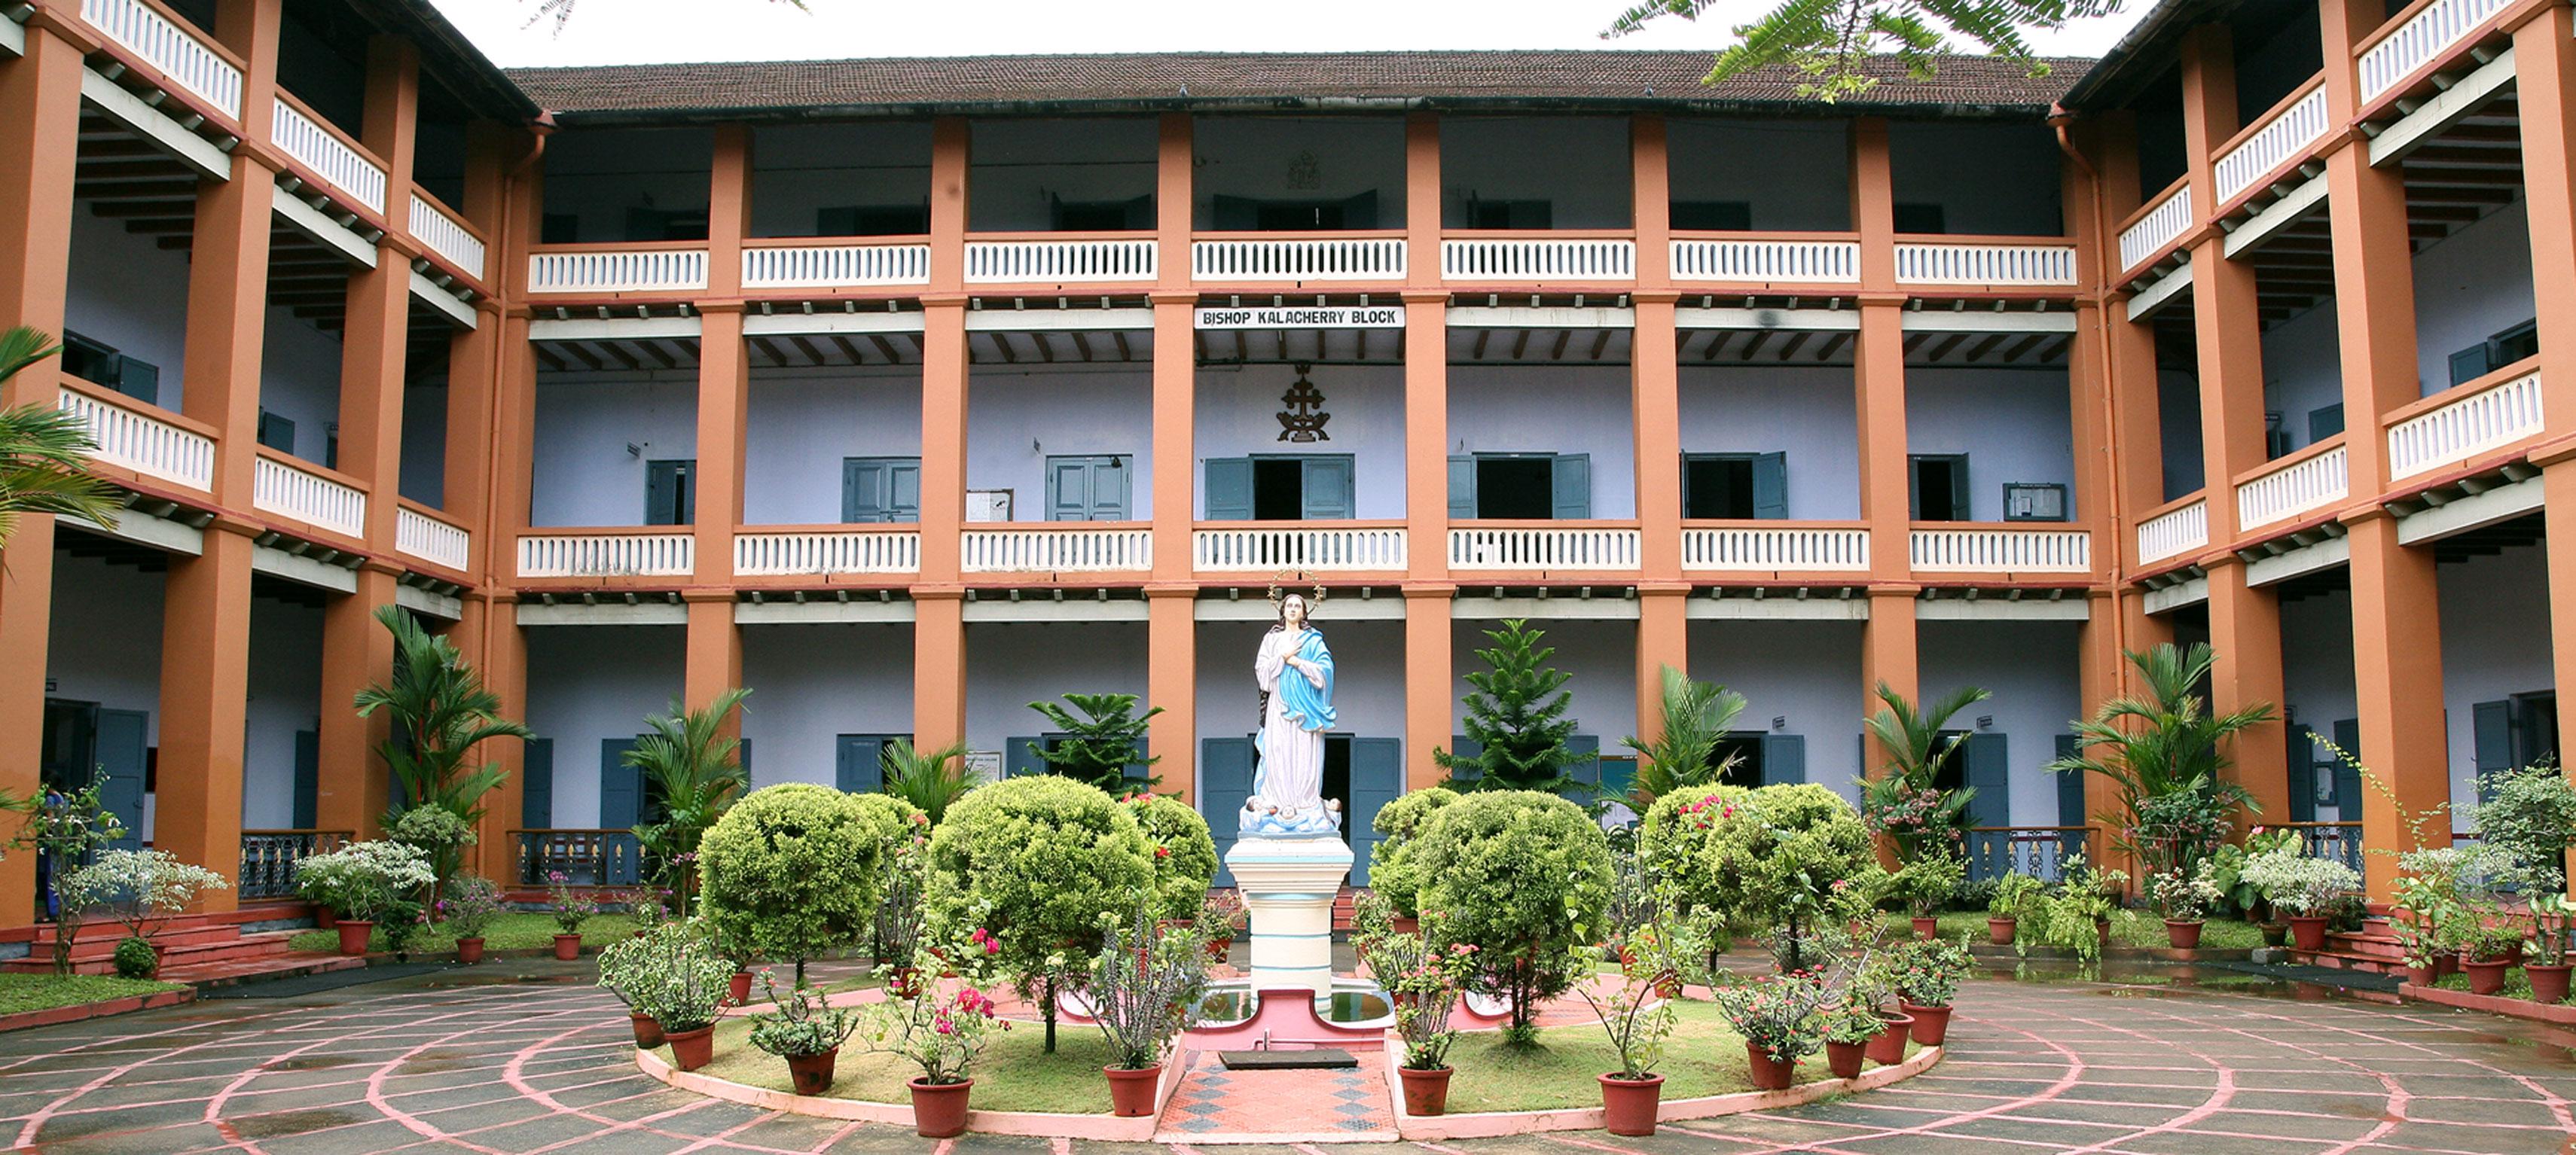 Assumption College, Kottayam